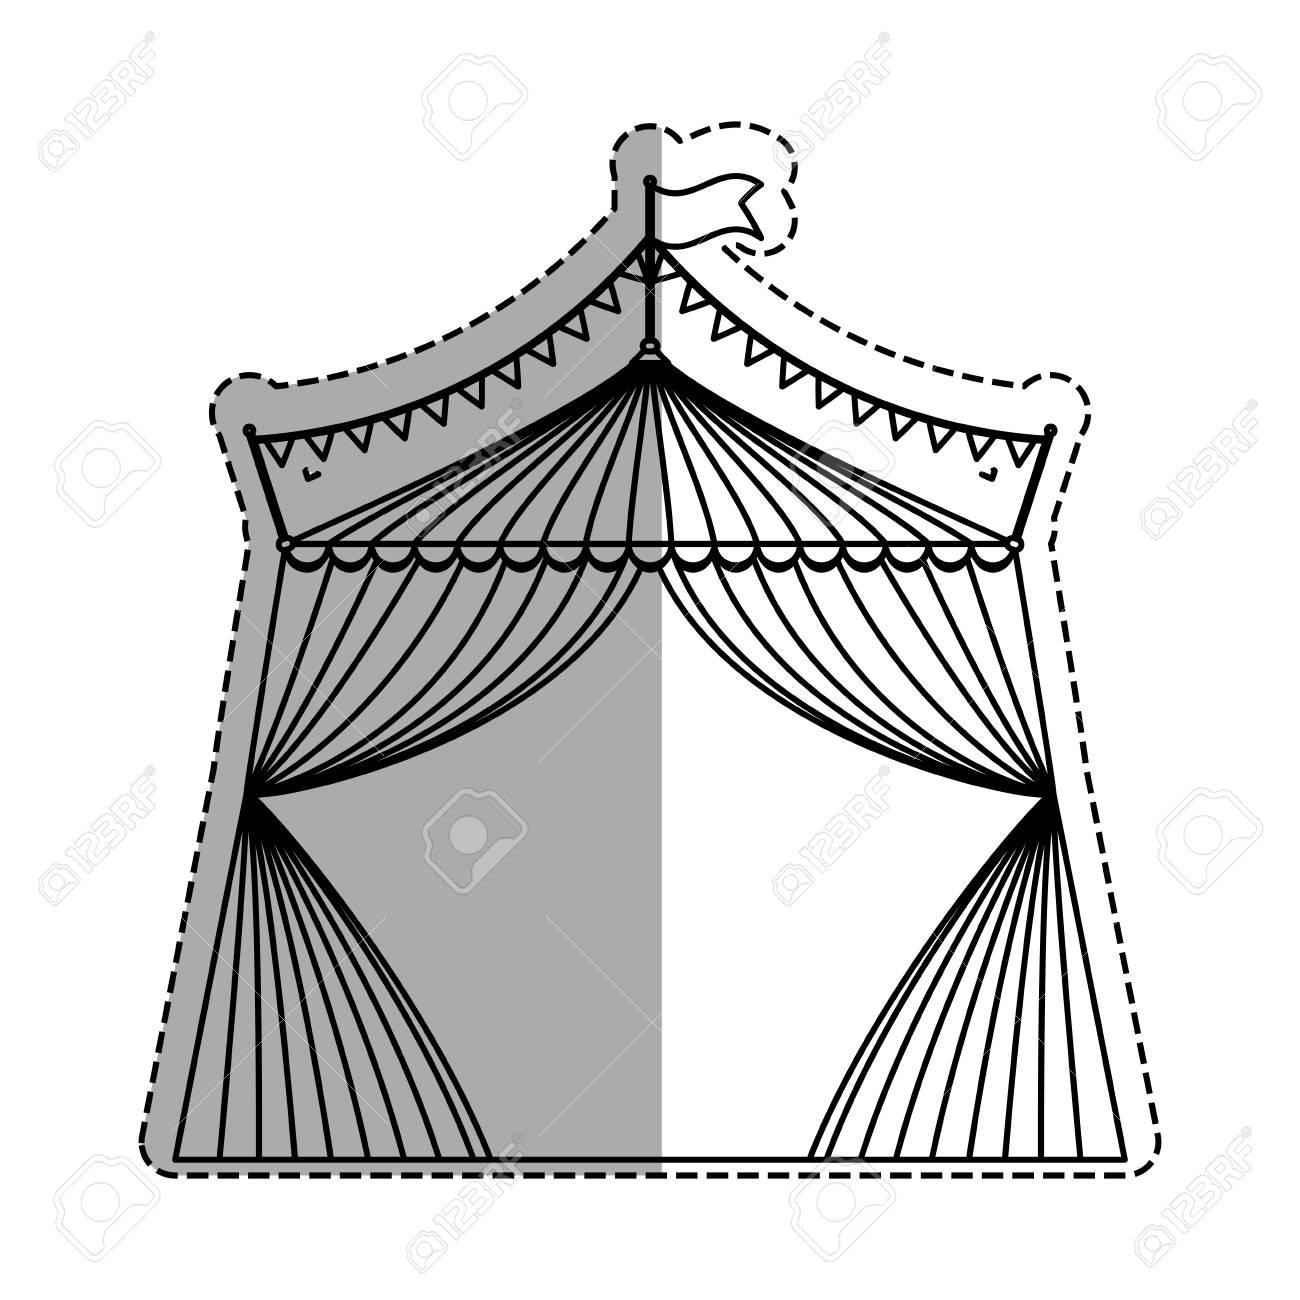 Circus tent festival icon vector illustration graphic design Stock Vector - 67261693  sc 1 st  123RF Stock Photos & Circus Tent Festival Icon Vector Illustration Graphic Design ...